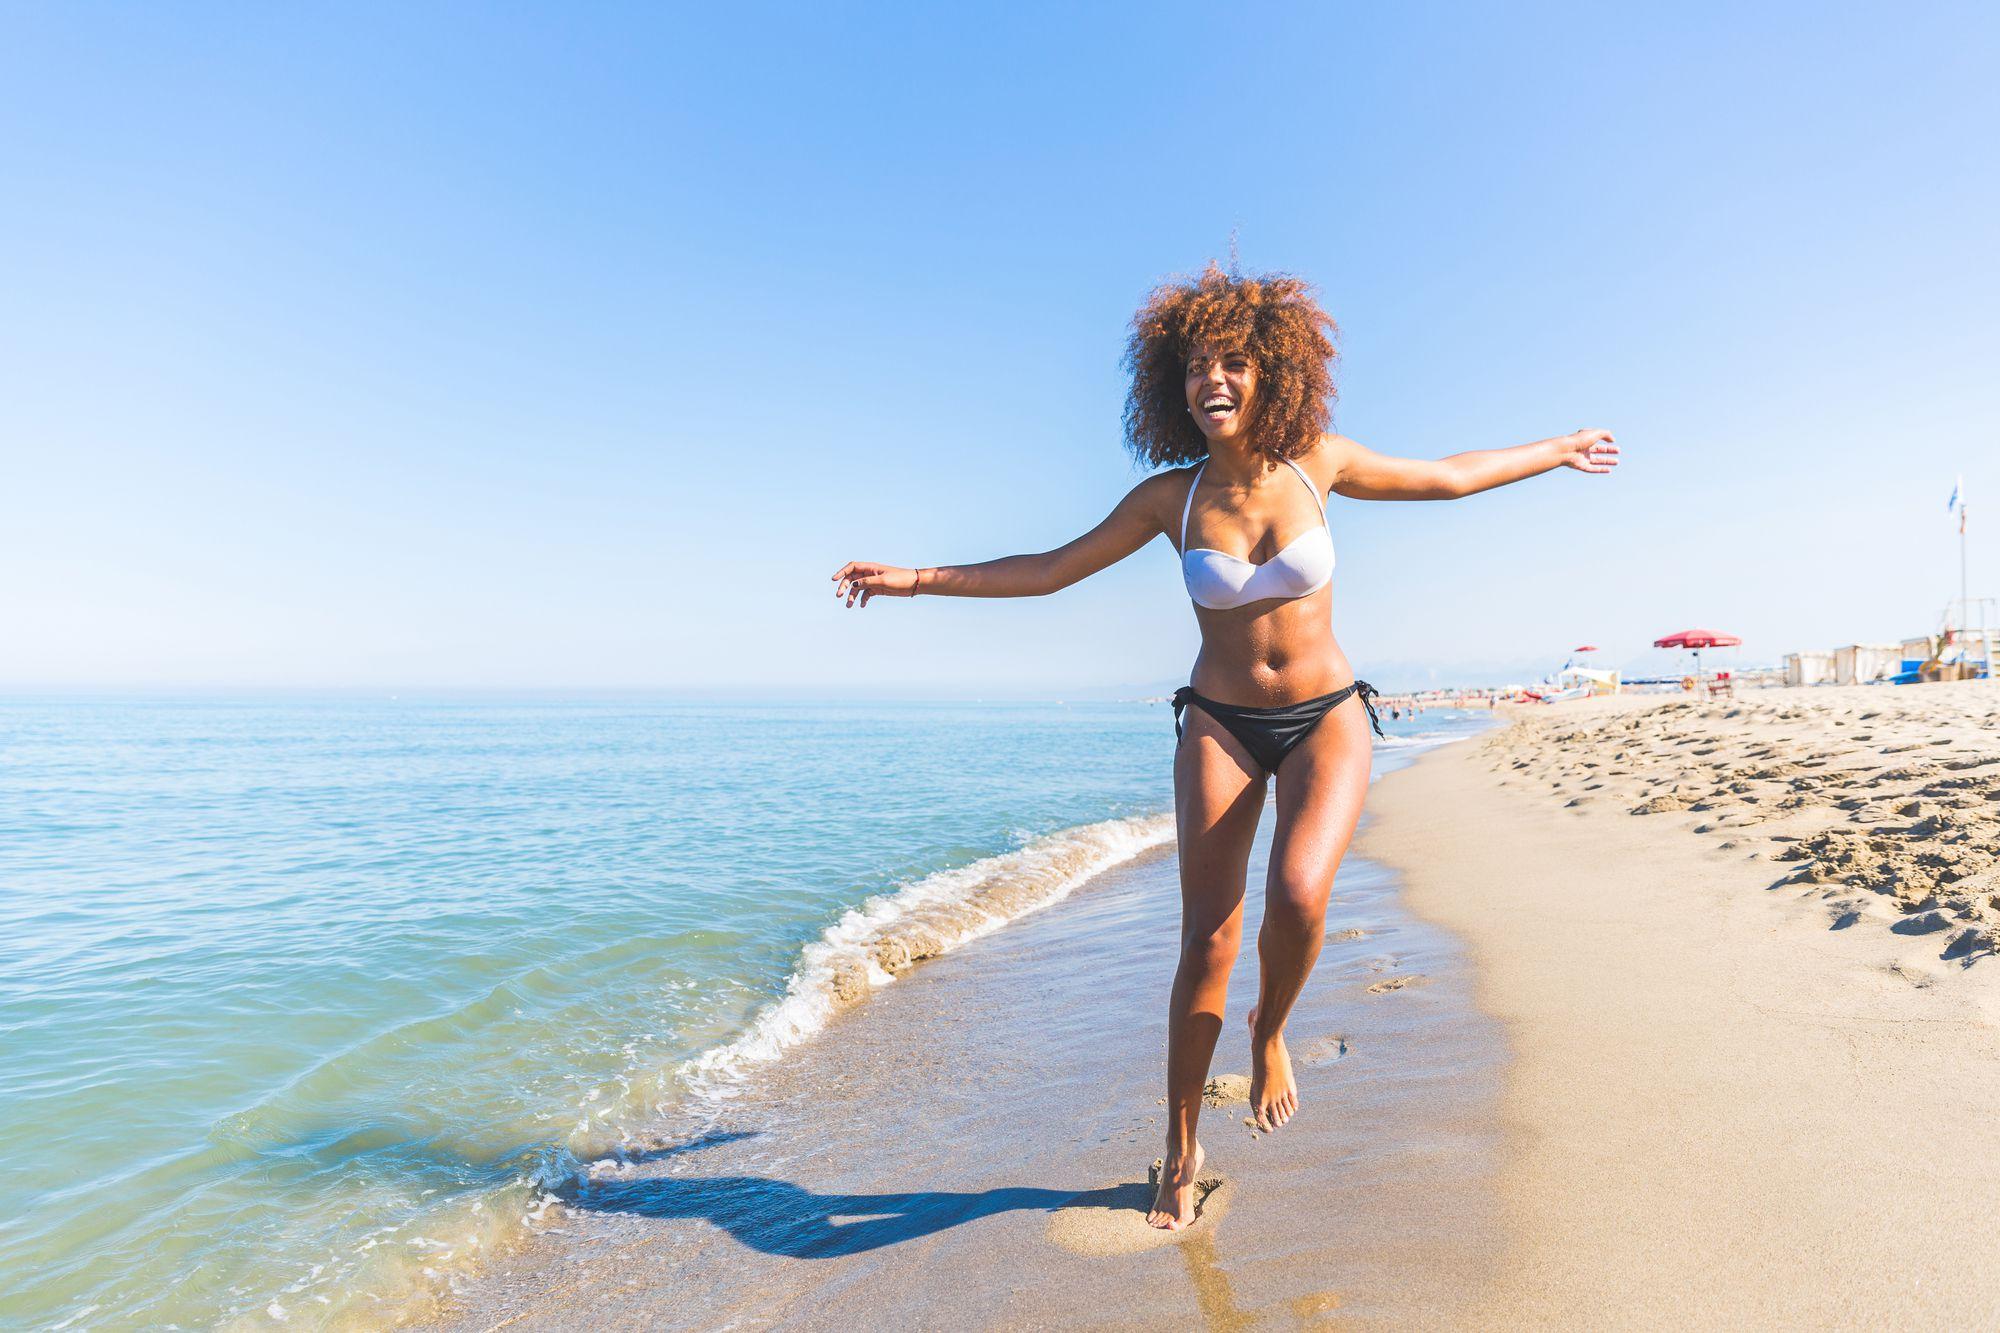 Entenda como escolher o biquíni ideal para o seu corpo